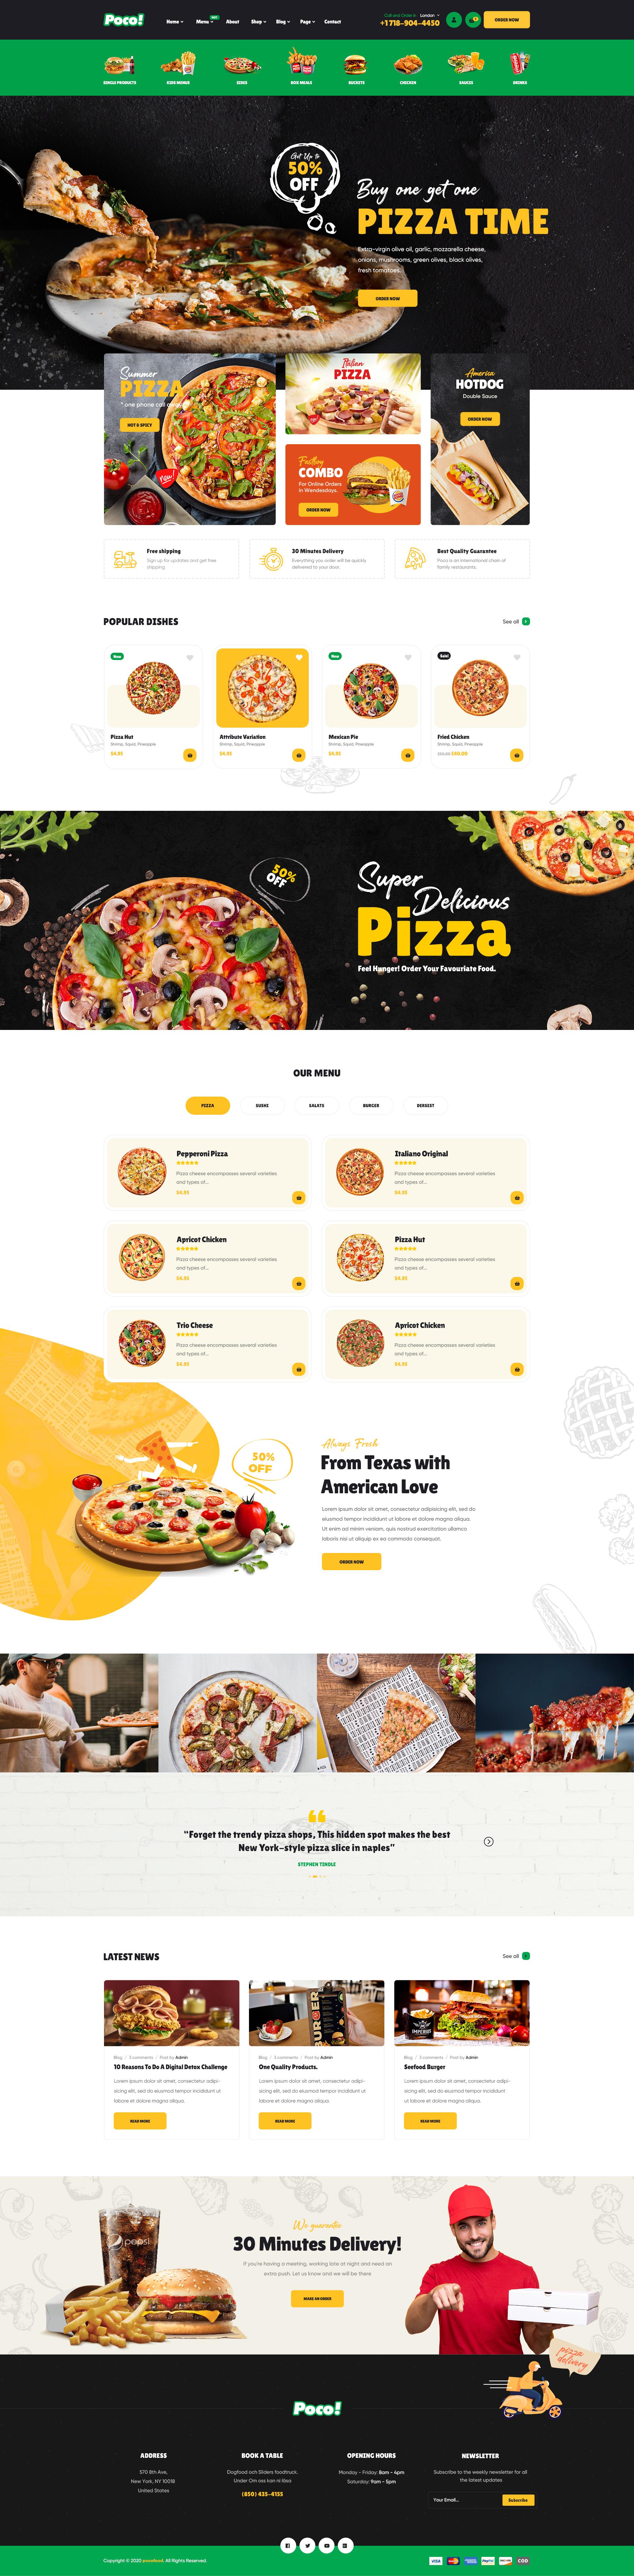 Poco Fast Food Restaurant Wordpress Theme By Pavothemes Themeforest